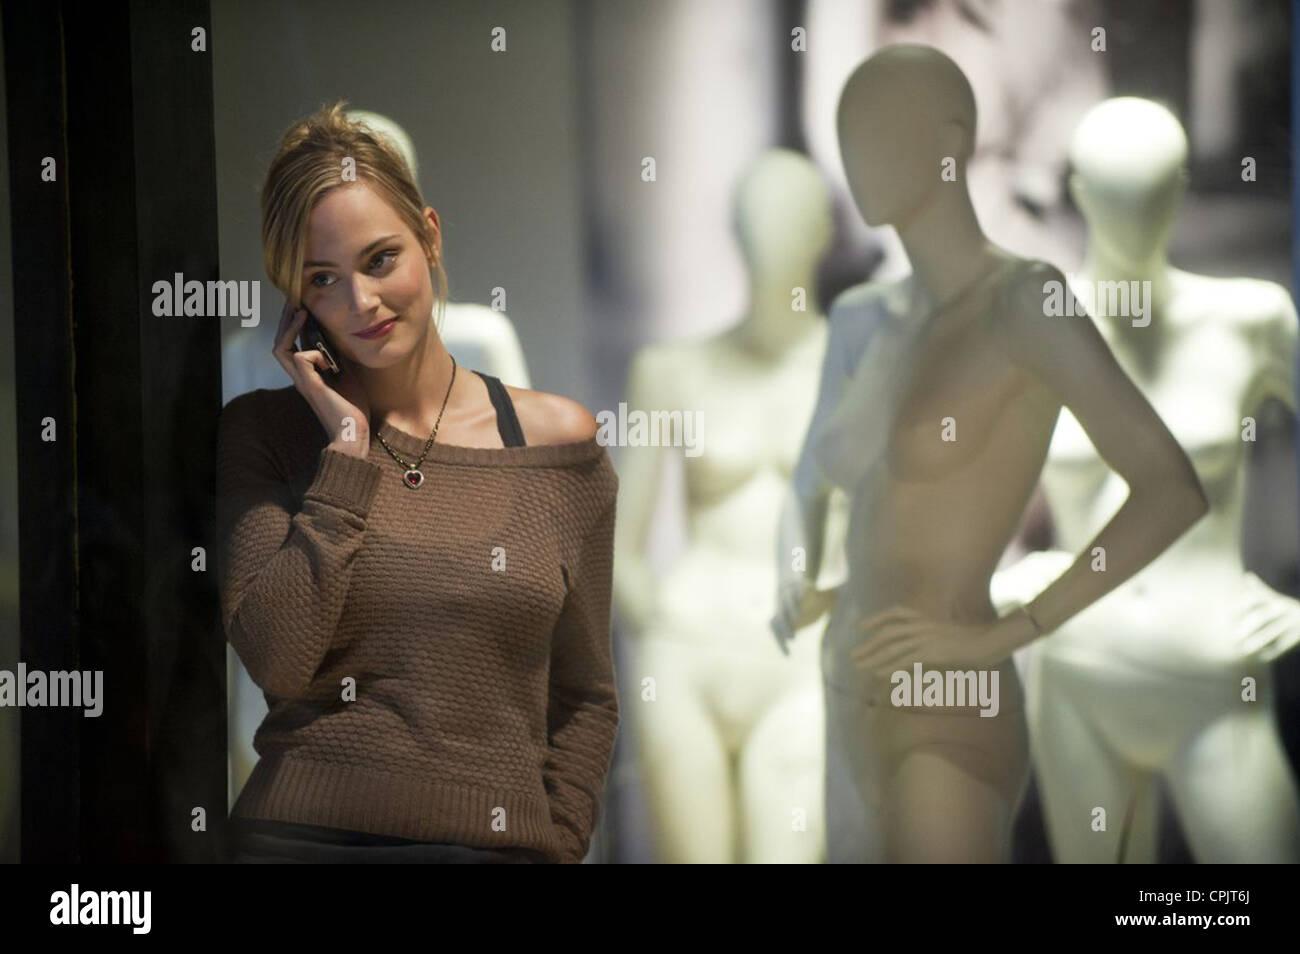 MANIAC (2012) NORA ARNEZEDER, FRANCK KHALFOUN (DIR) 003 MOVIESTORE COLLECTION LTD - Stock Image